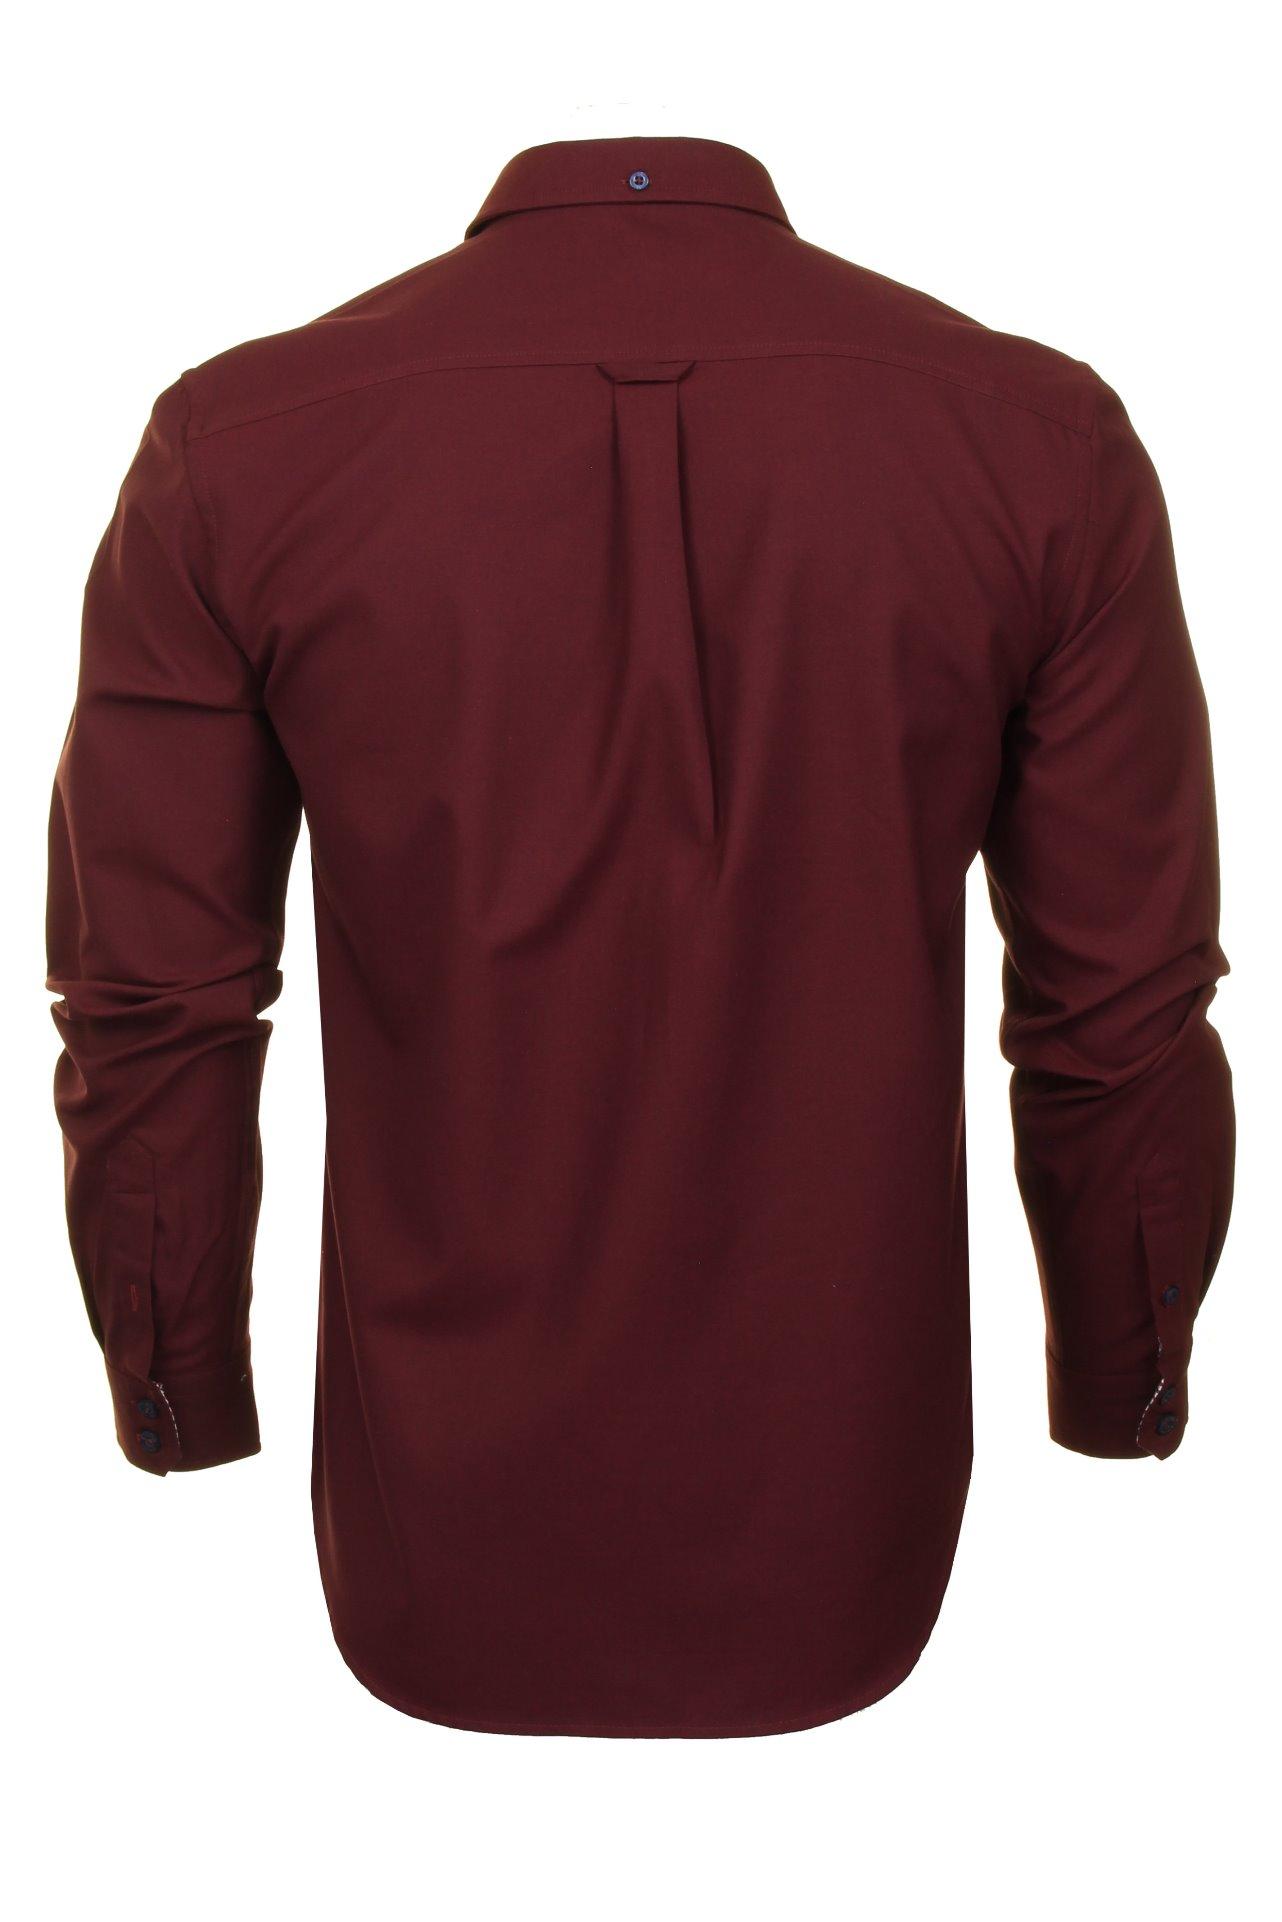 Mens-Oxford-Shirt-by-Ben-Sherman-Long-Sleeved miniatuur 10